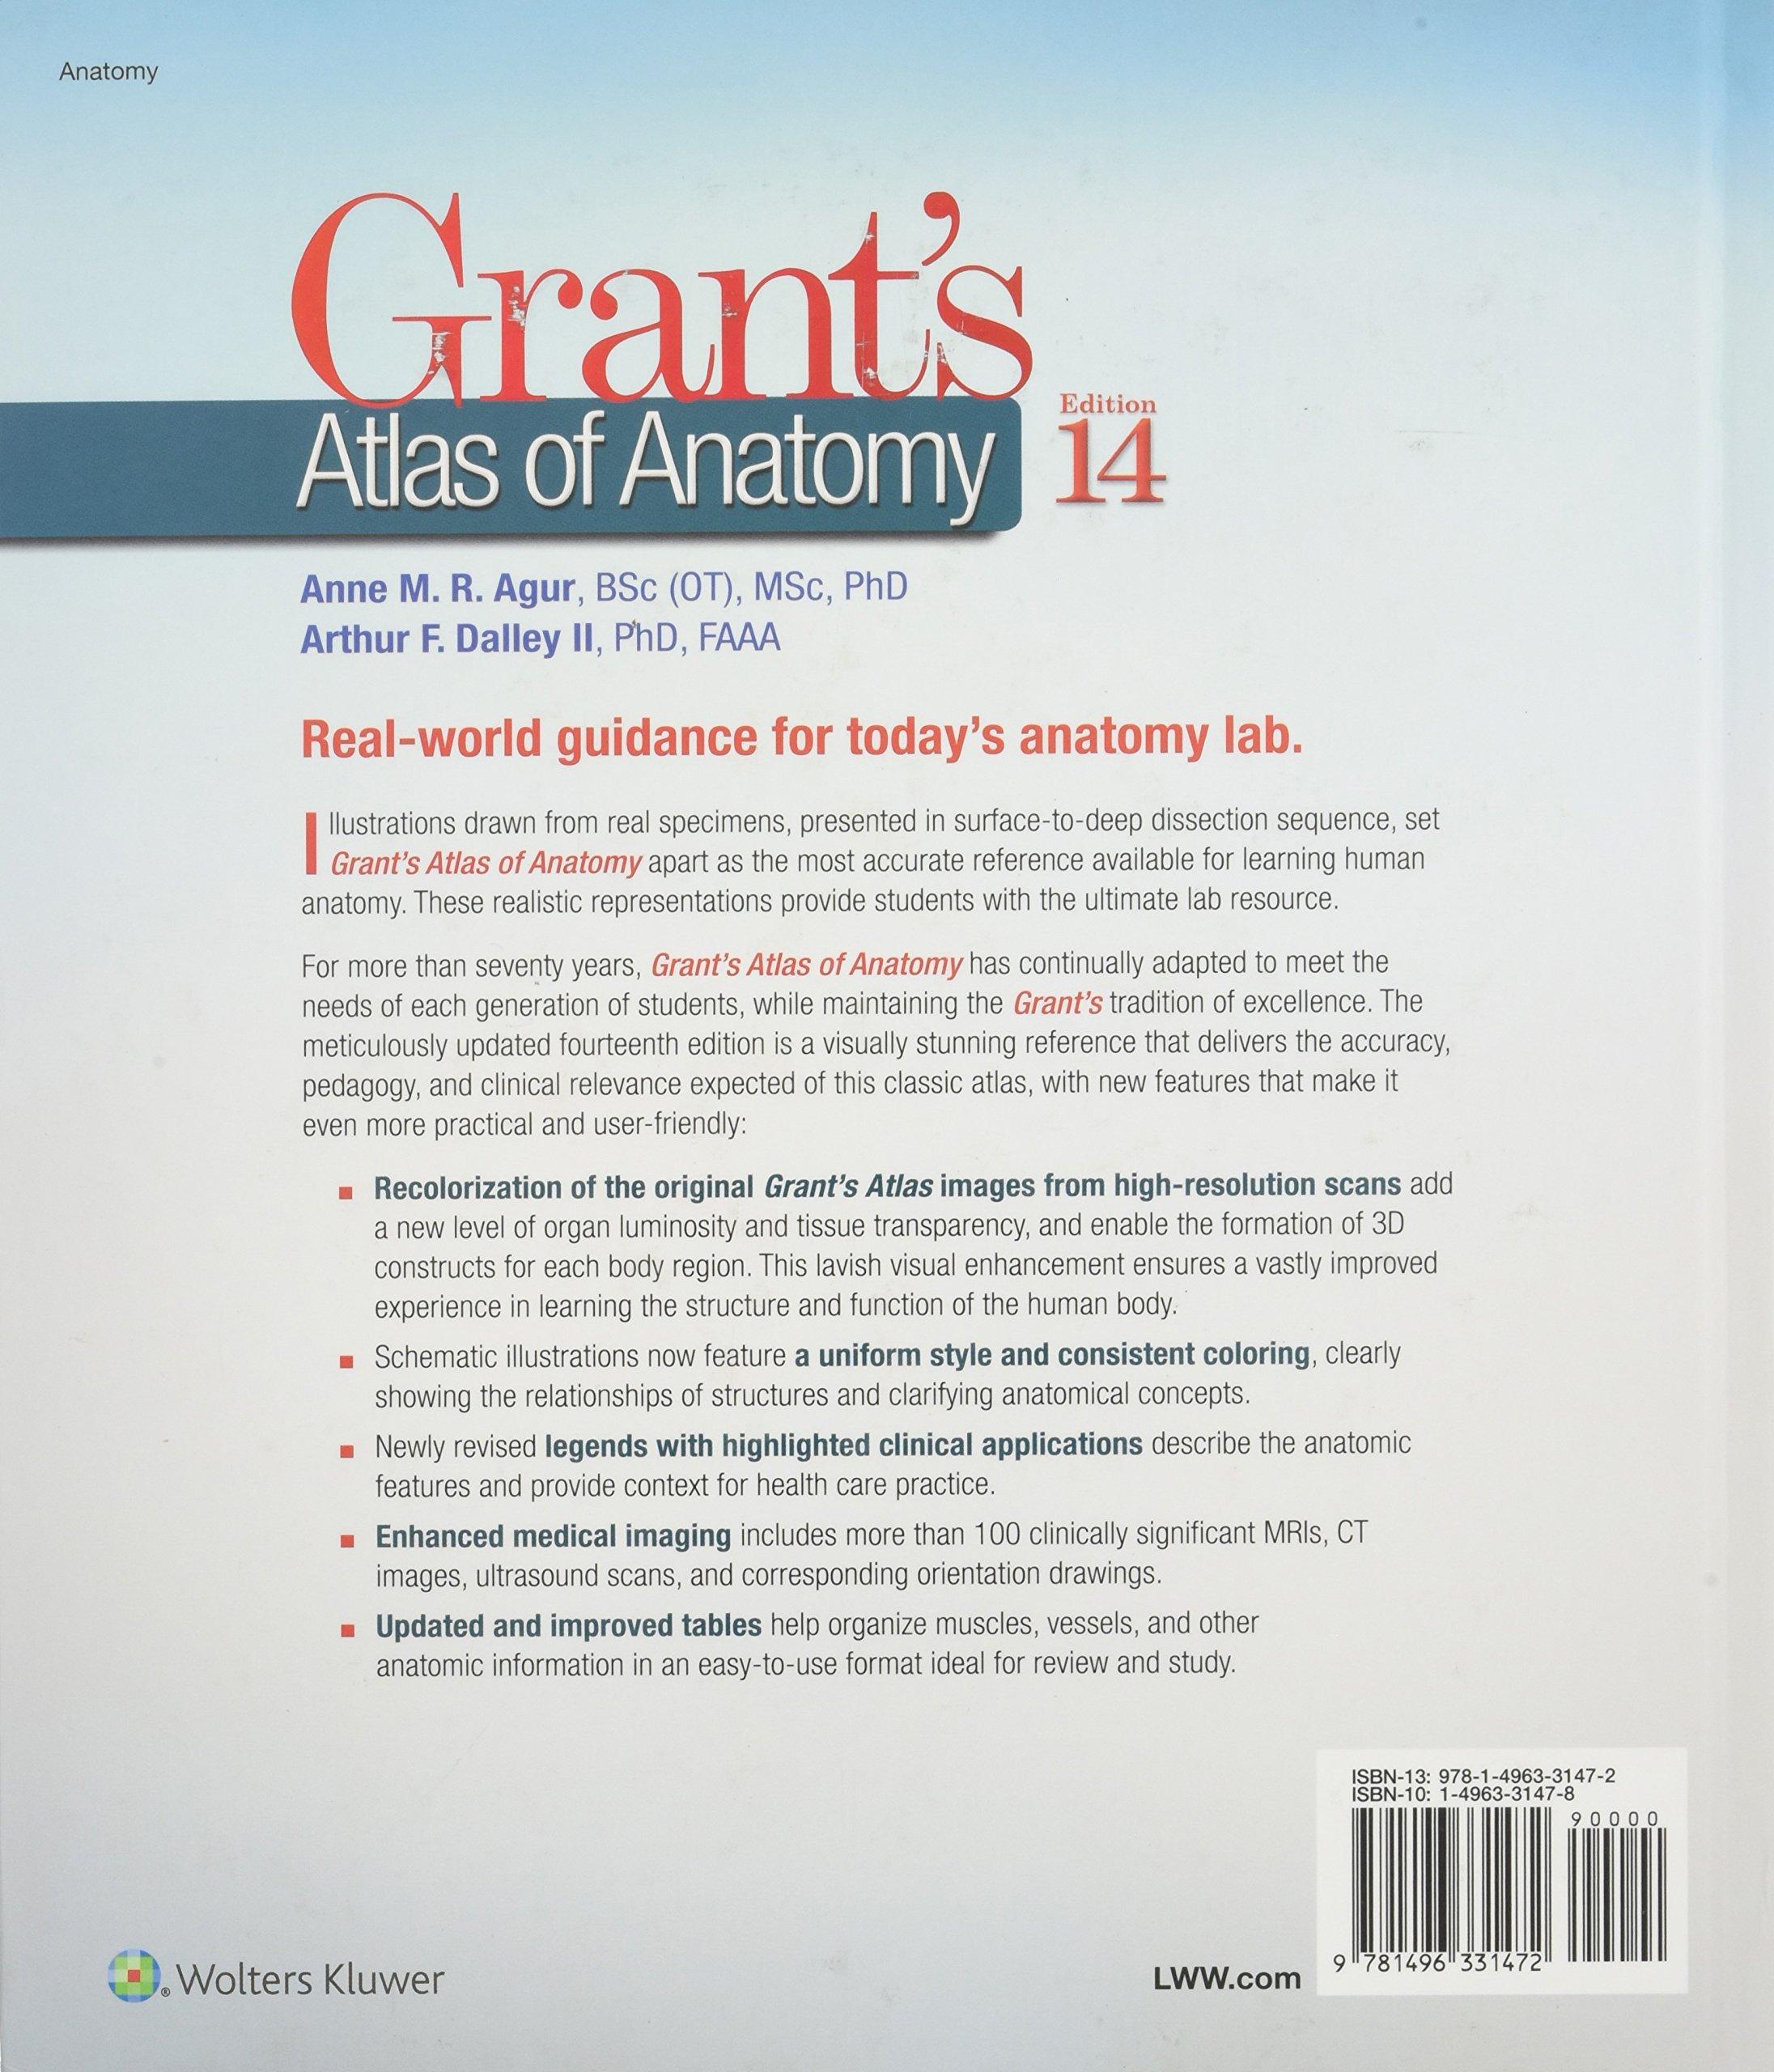 Grant\'s Atlas of Anatomy: Amazon.de: Anne M. R. Agur, Arthur F ...